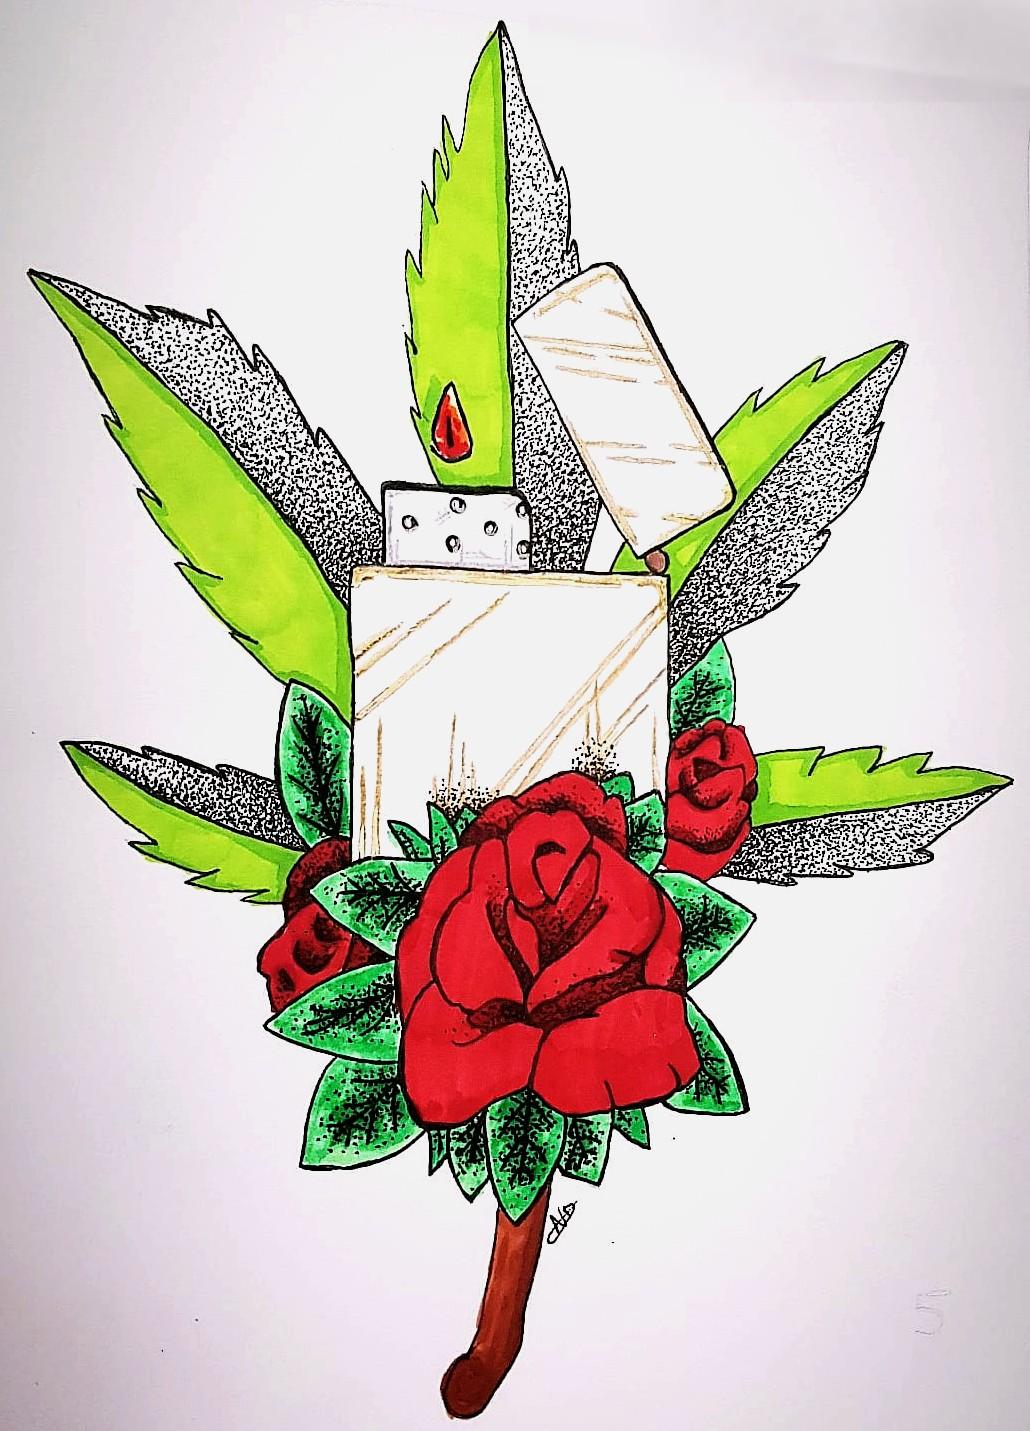 Zipo cannabis